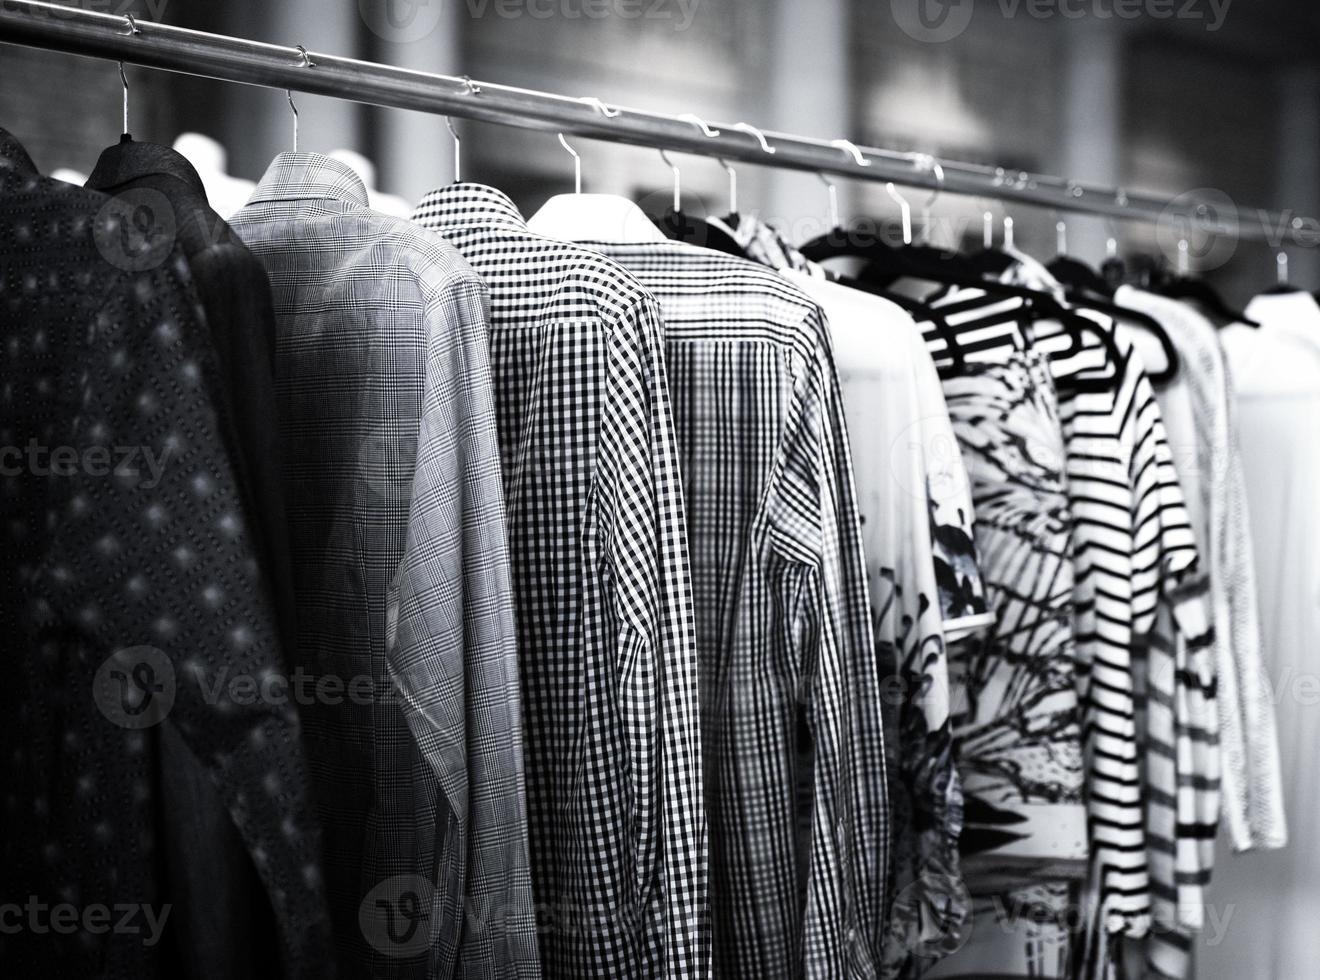 Men's Shirts on Clothes Rack photo